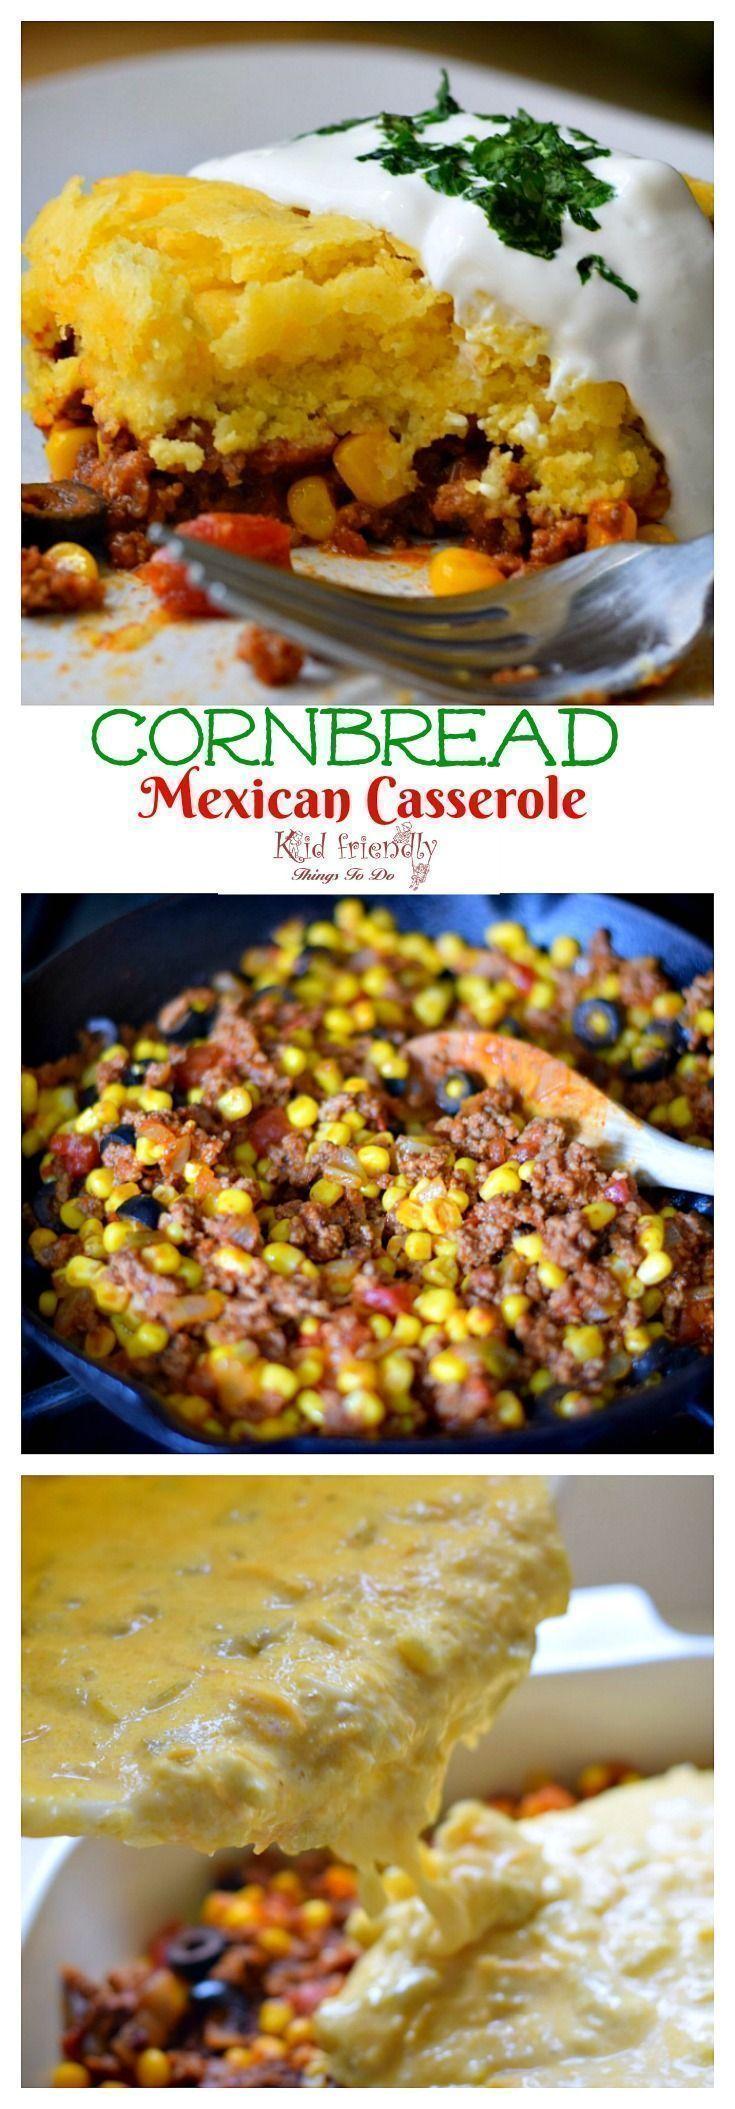 Mexican Cornbread Casserole images